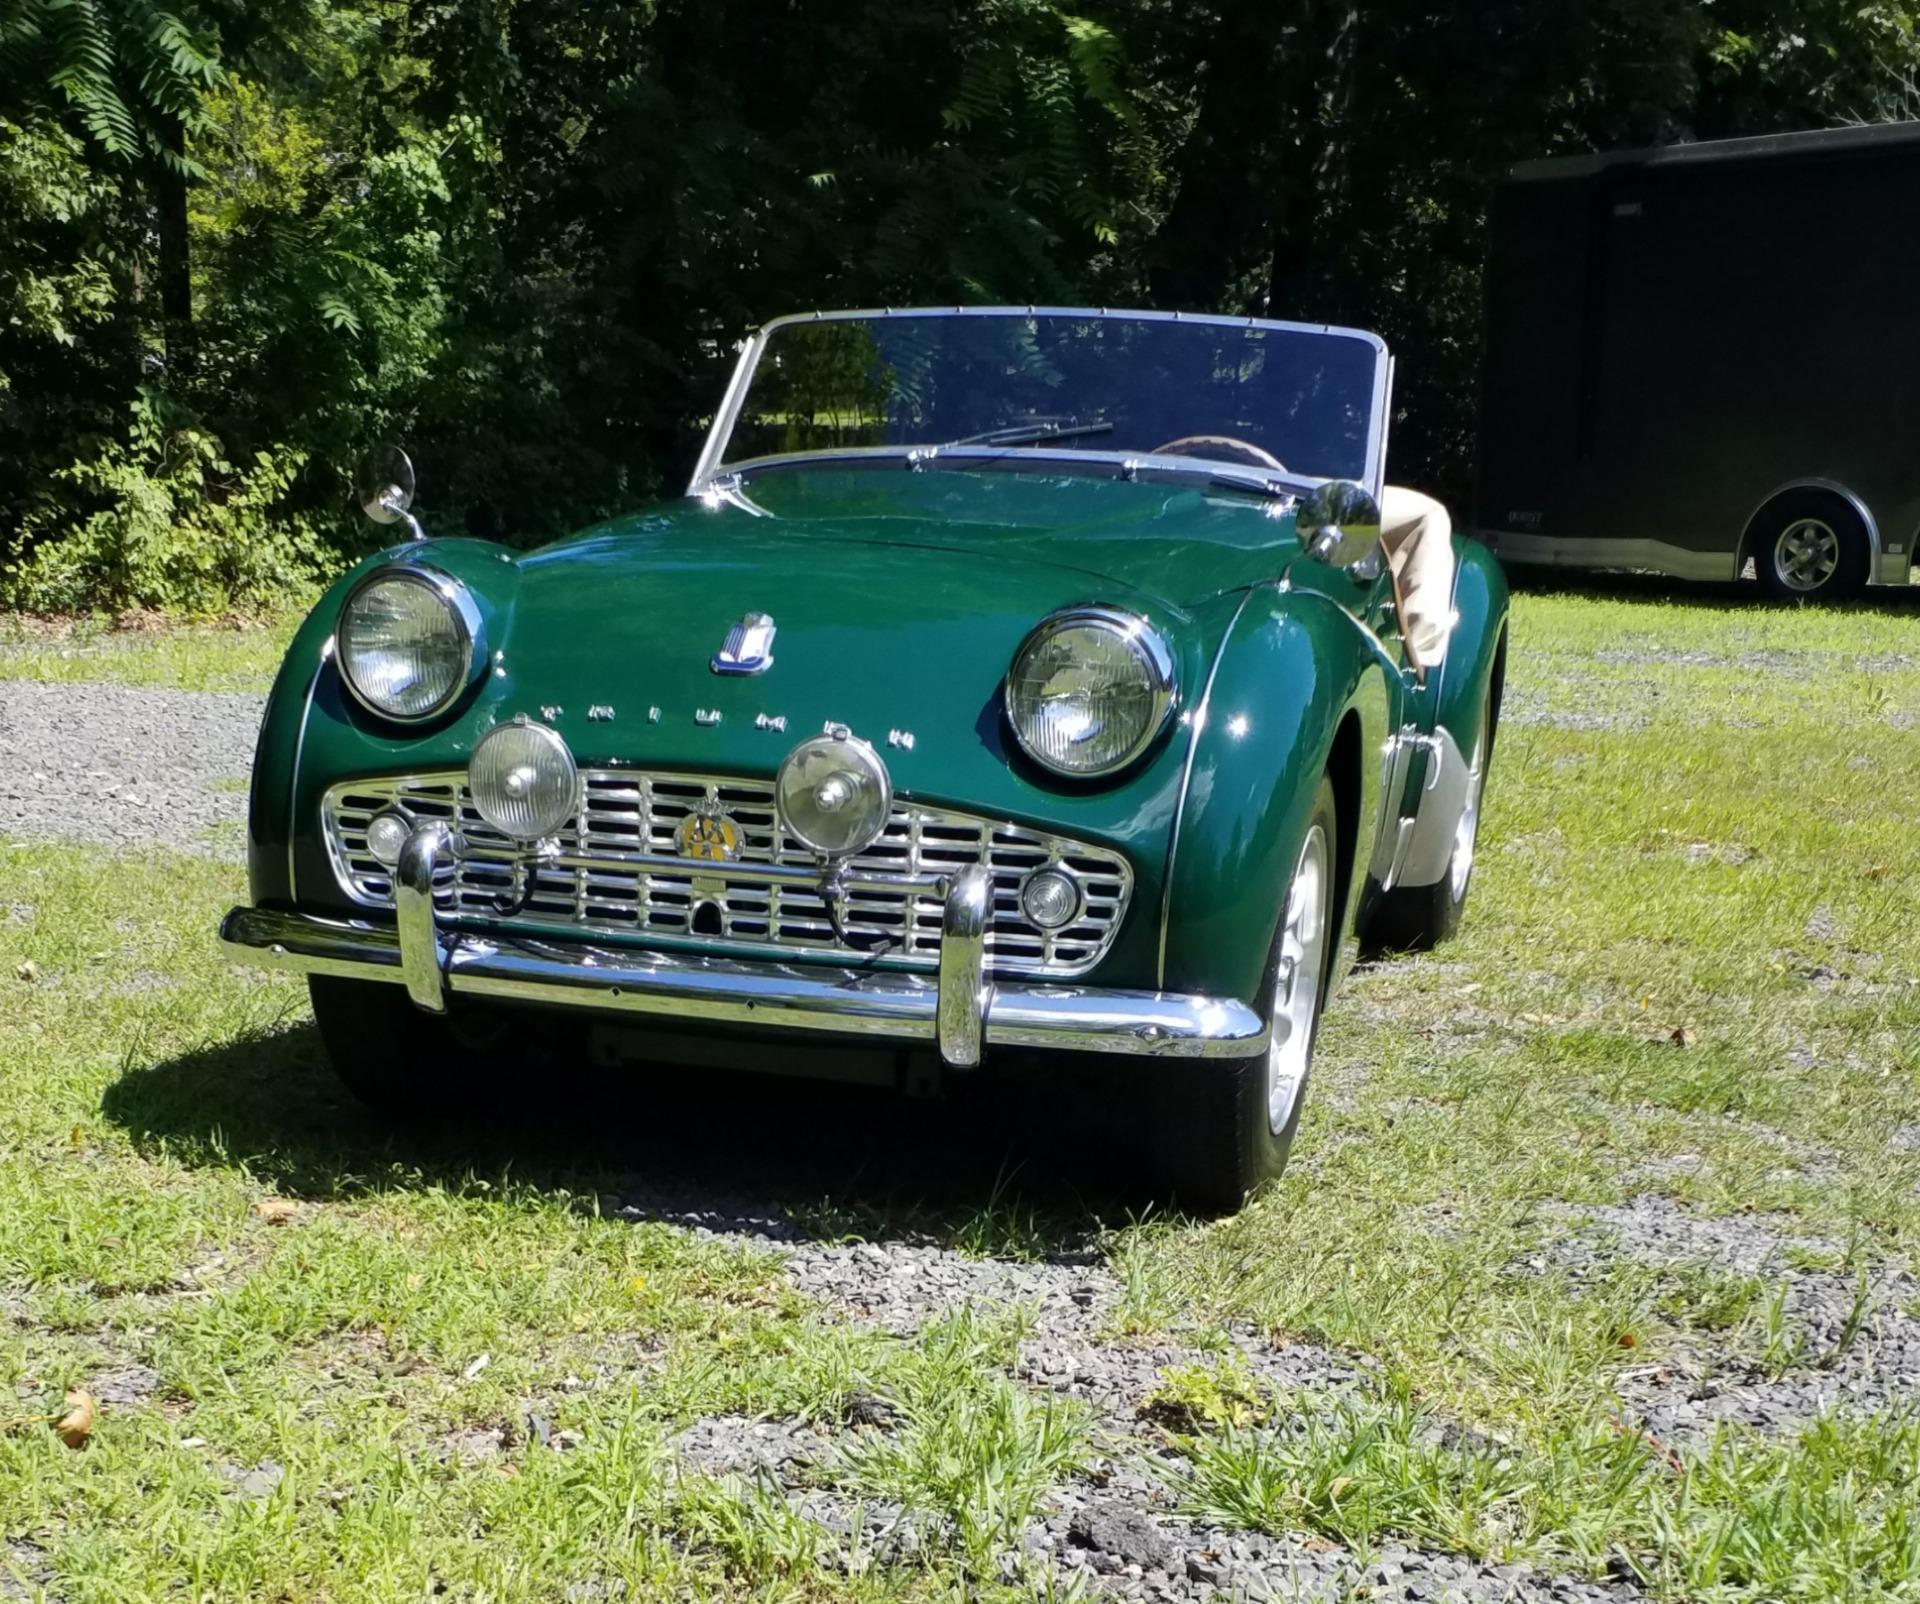 Used-1959-Triumph-TR-3